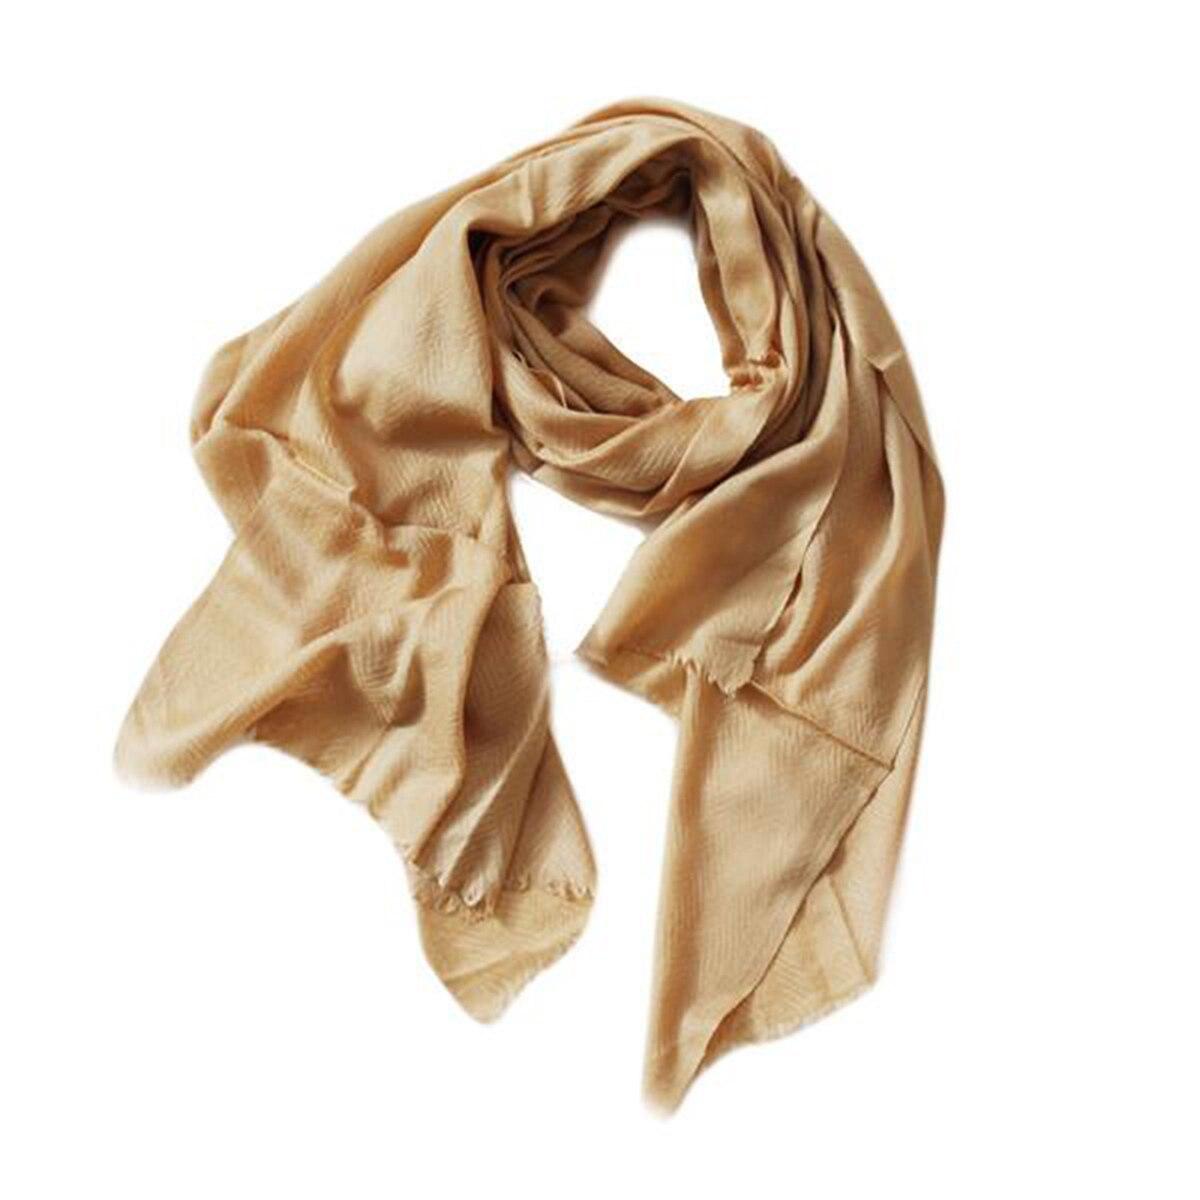 Caramel Wool Blend Scarf from Siyana London